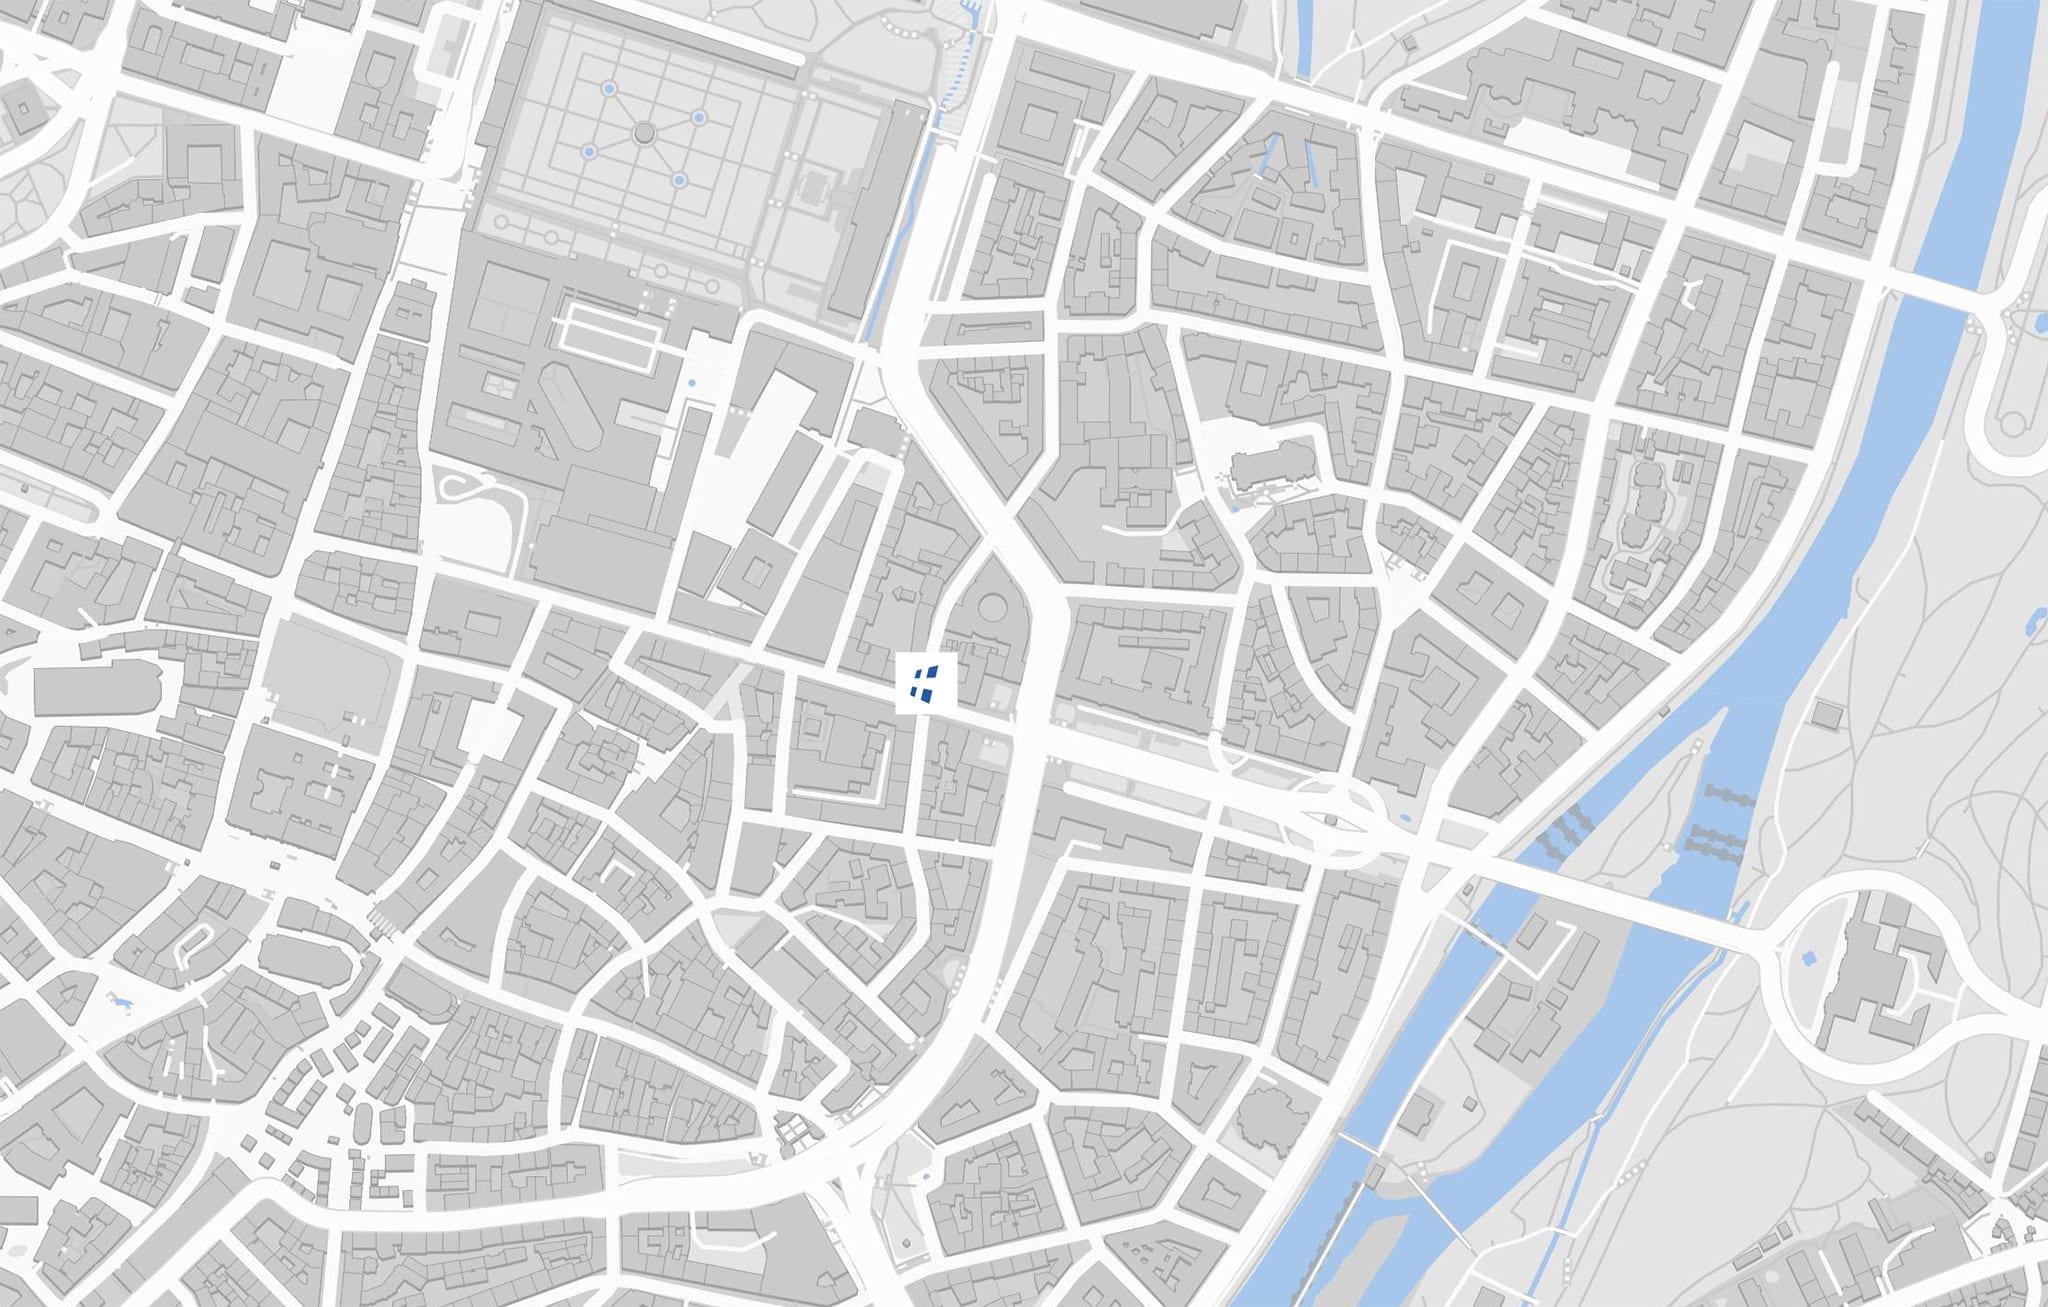 https://www.sda-partner.de/wp-content/uploads/2020/05/SDA-map.jpg